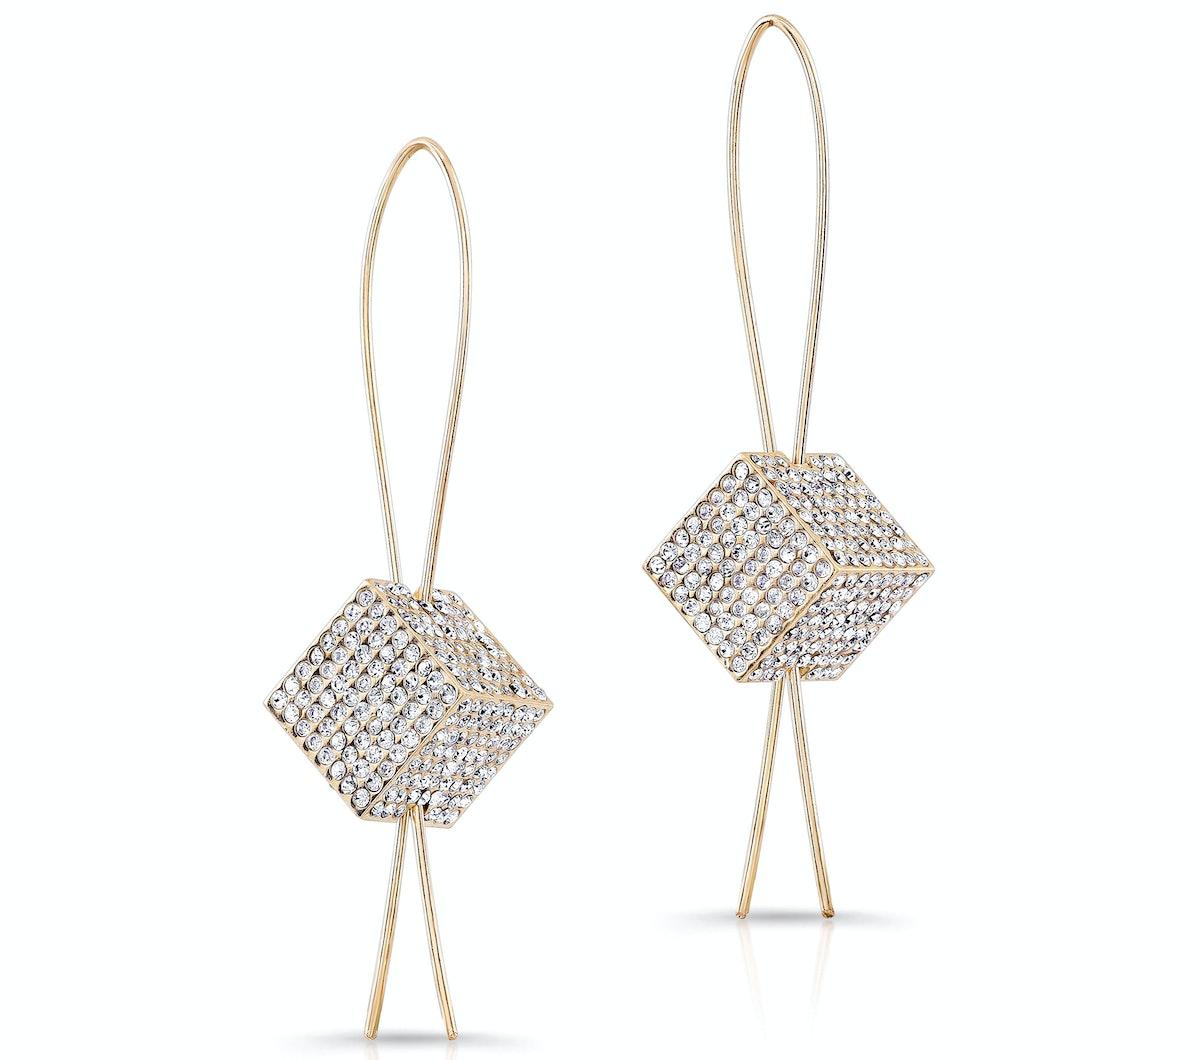 Vita Fede earrings with Swarovski crystals